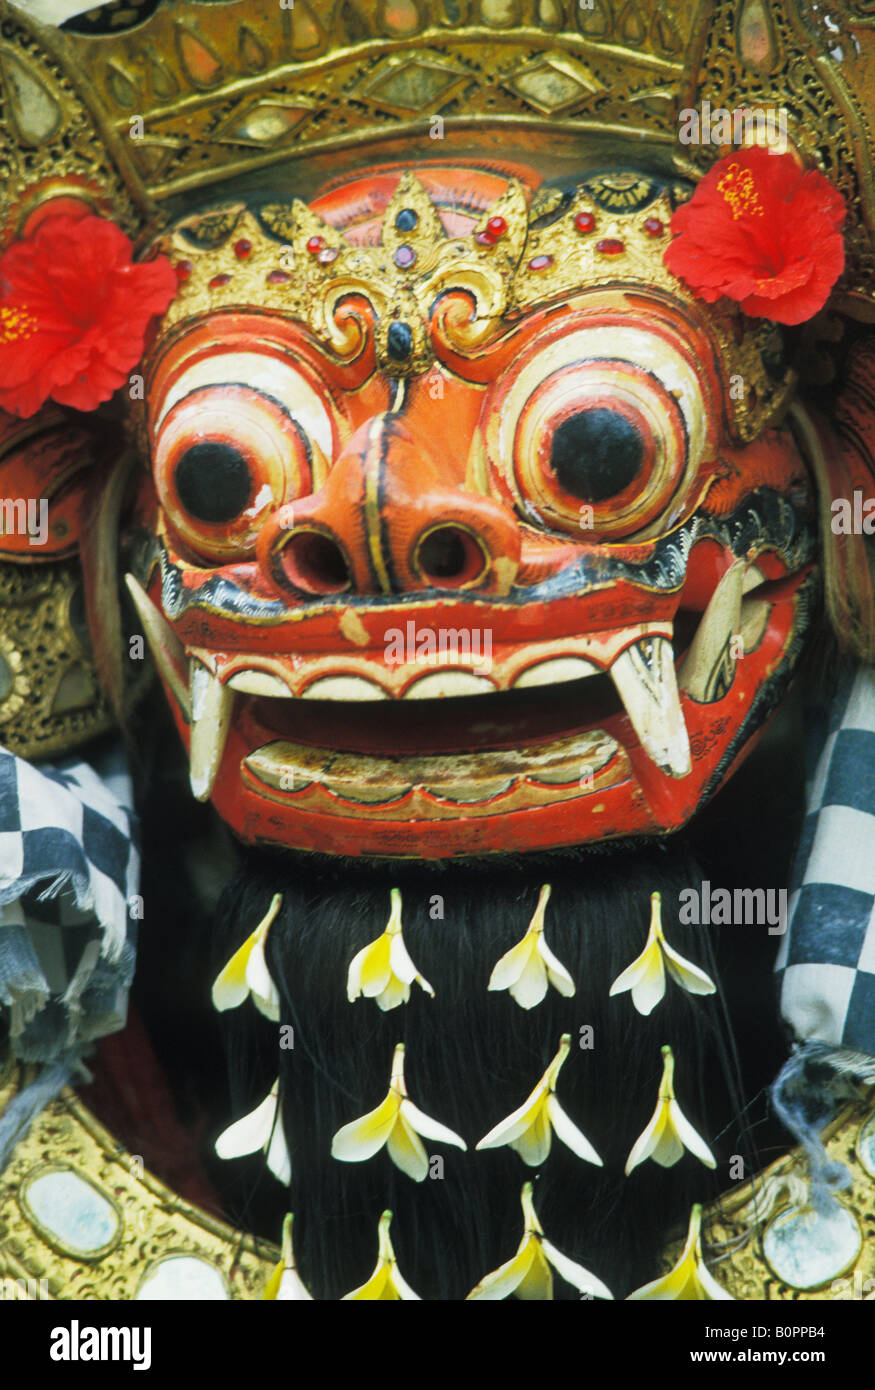 Mask at Barong Dance in Batubulan Bali Indonesia - Stock Image